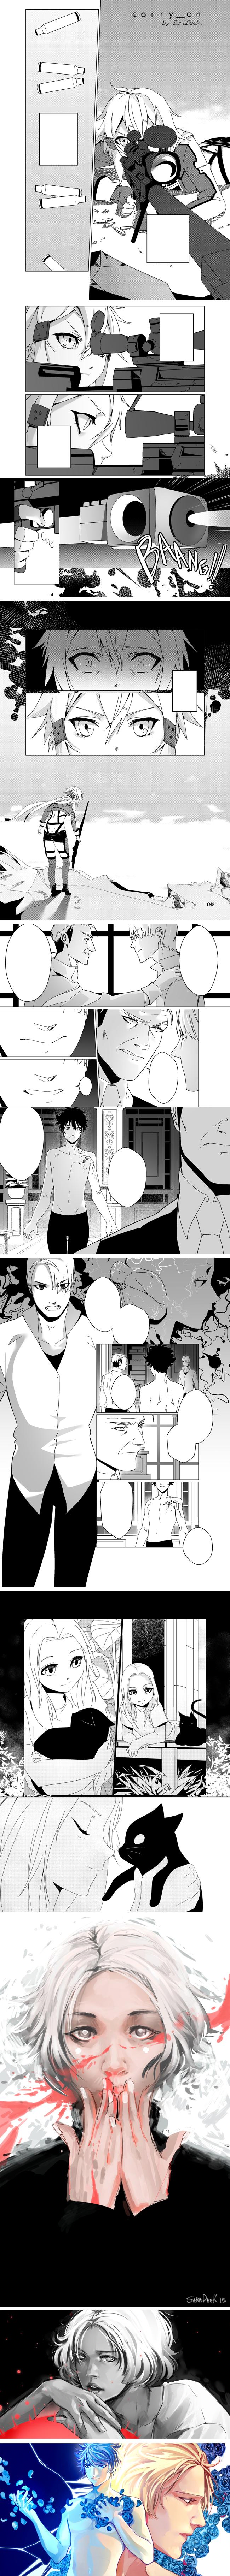 curso_taller_manga_clip_studio_manga_studio_academiac10_madrid